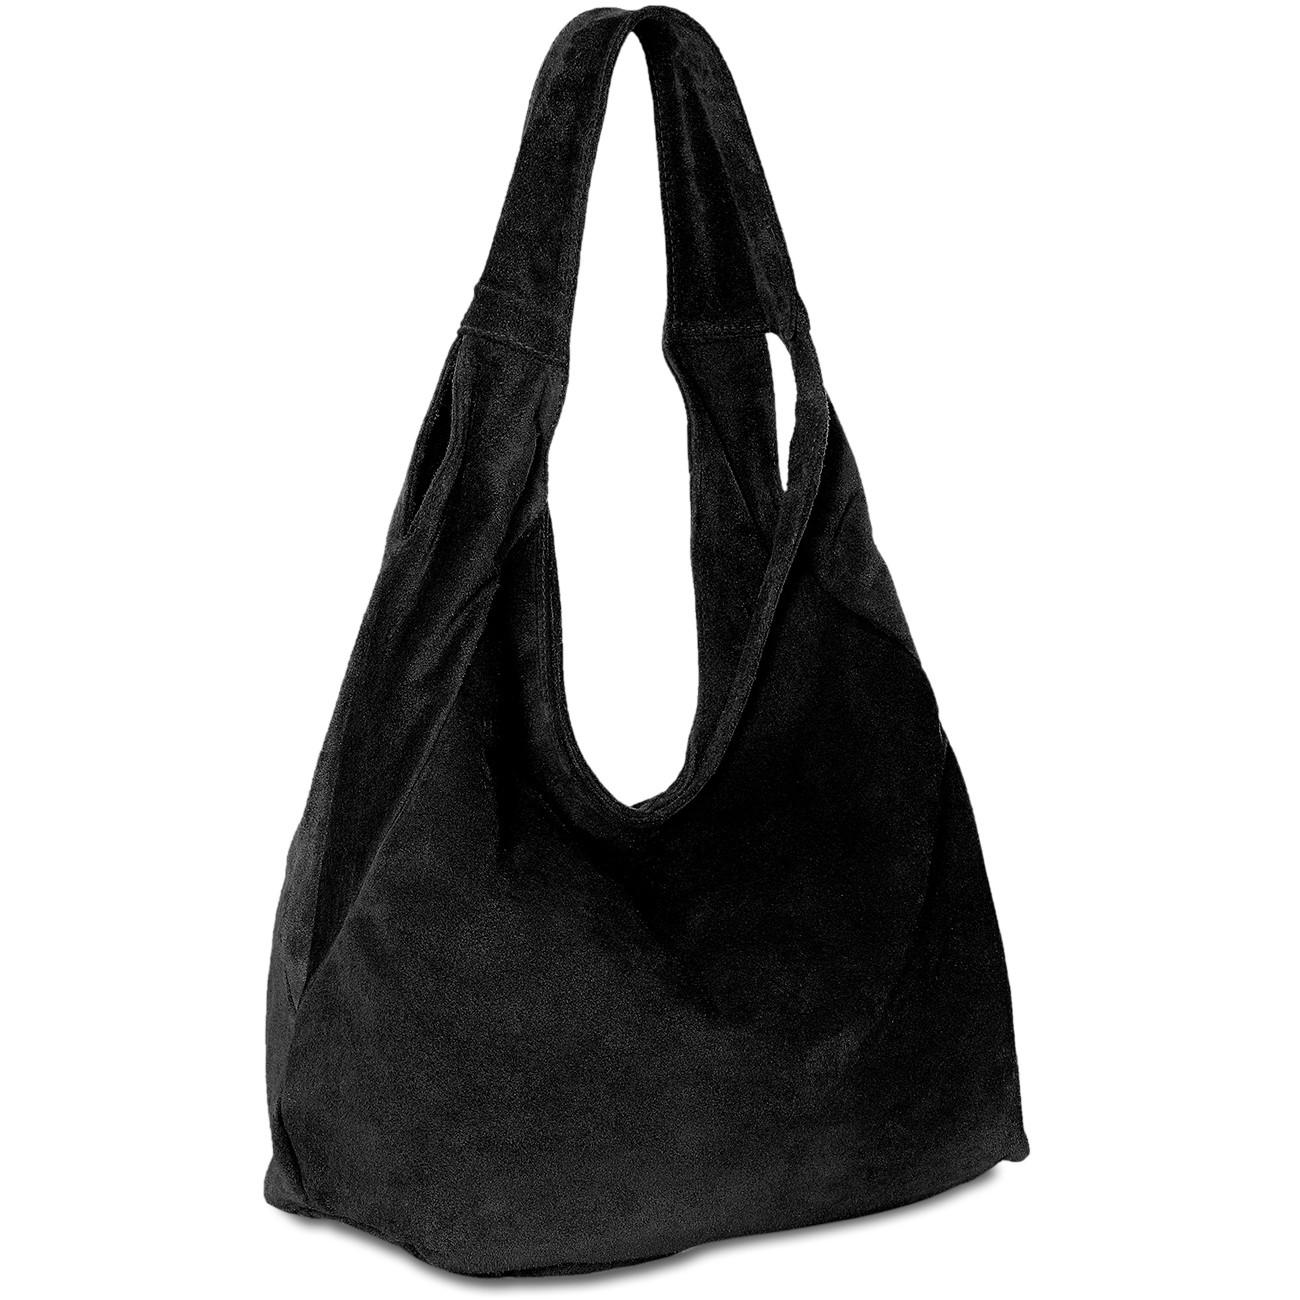 caspar tl618 damen ledertasche shopper beuteltasche hobo bag aus echt leder wildleder taschen. Black Bedroom Furniture Sets. Home Design Ideas